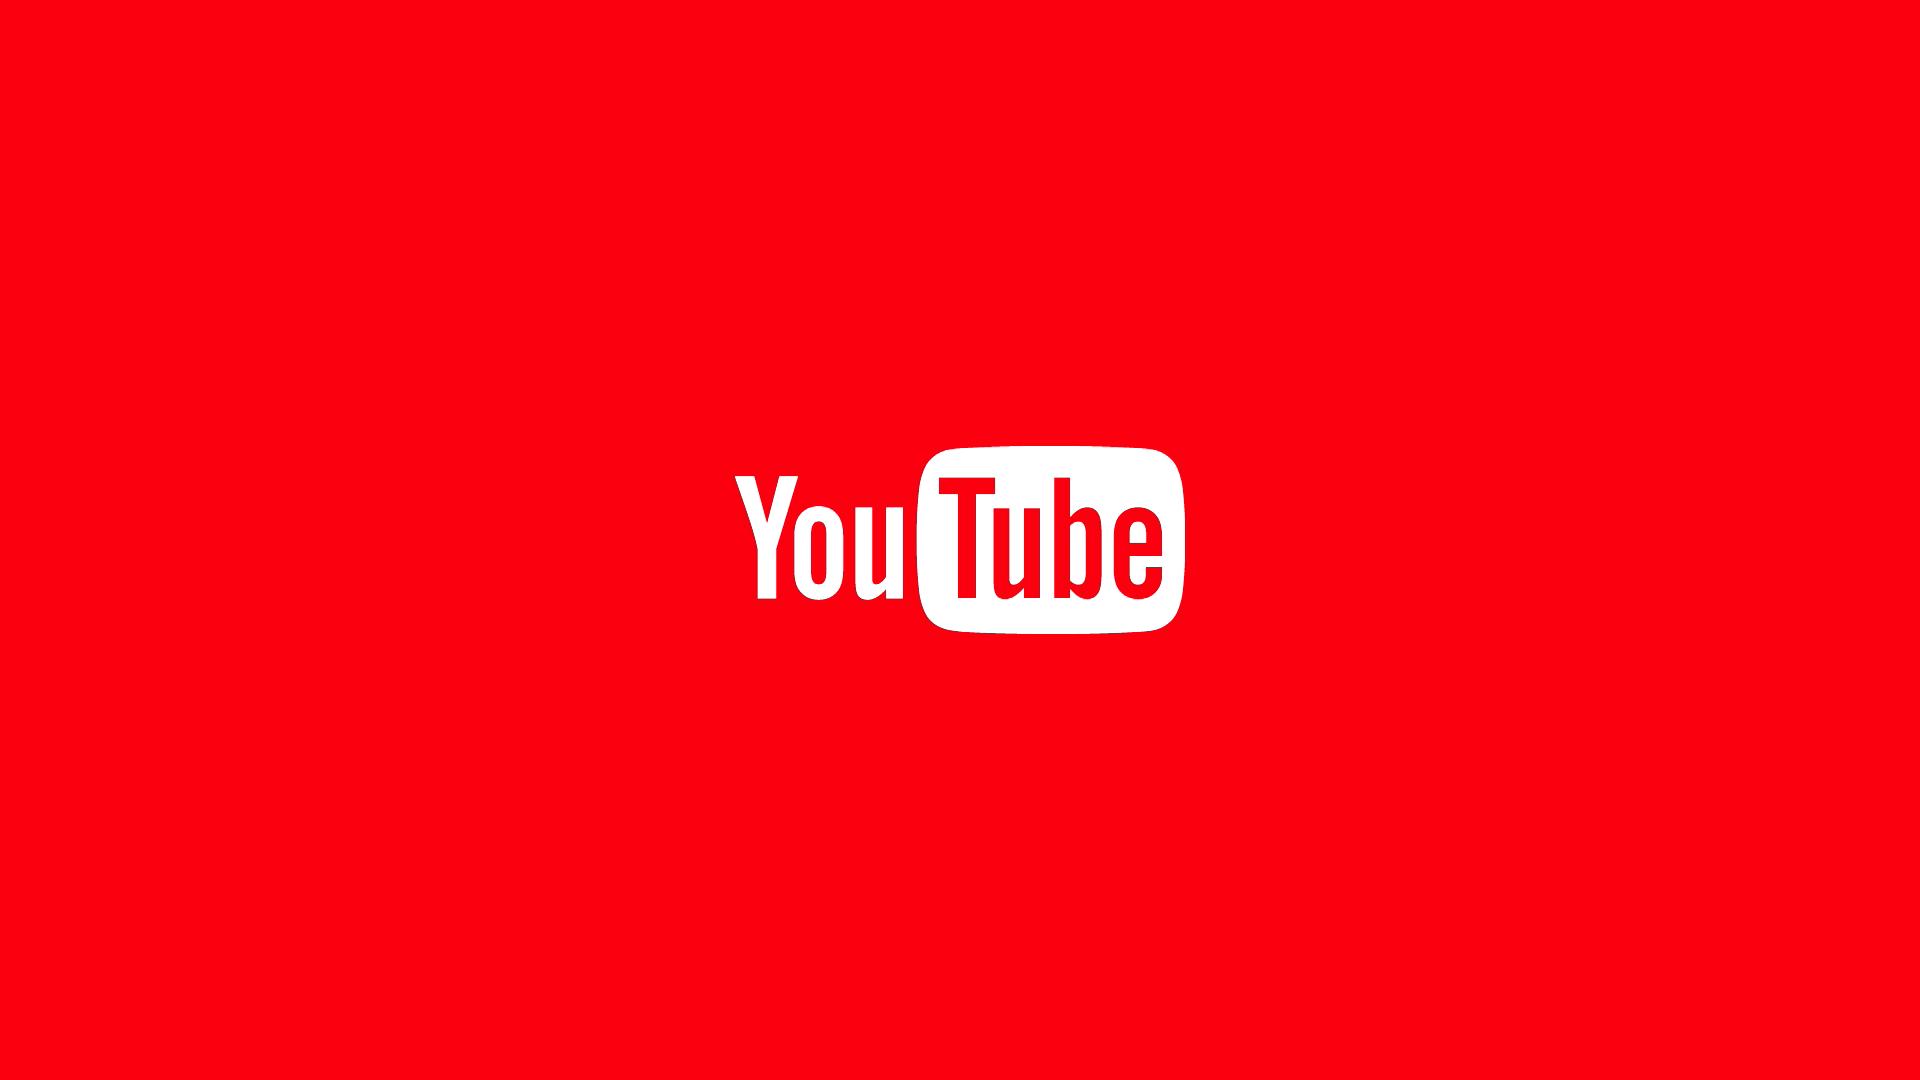 youtube logo hd wallpapers.